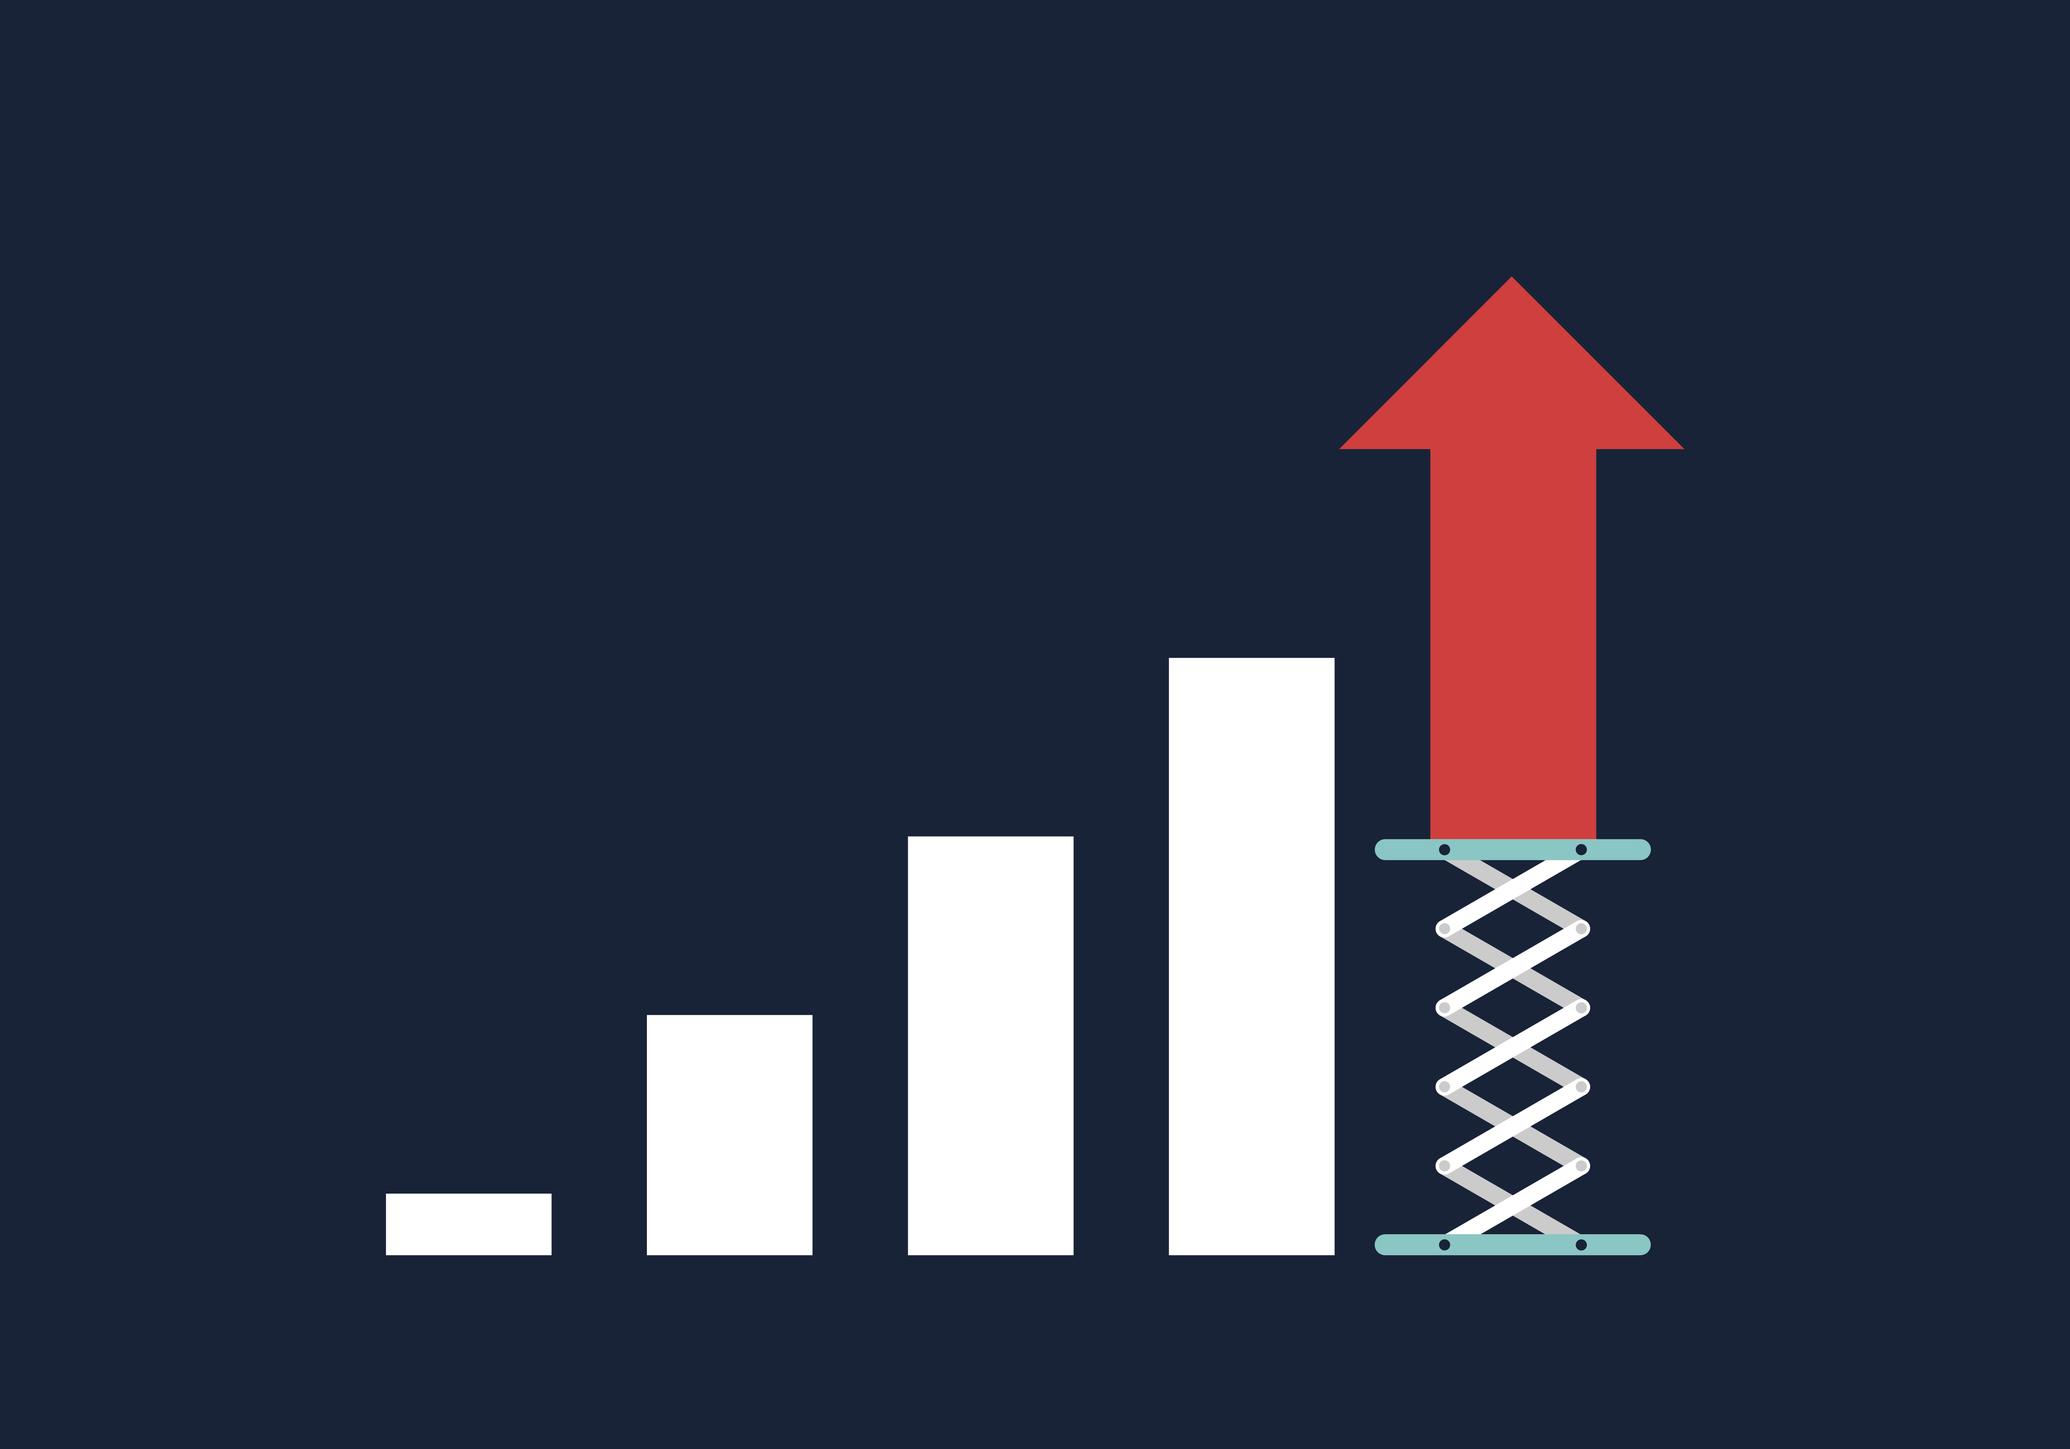 A bar chart symbolizing growth.